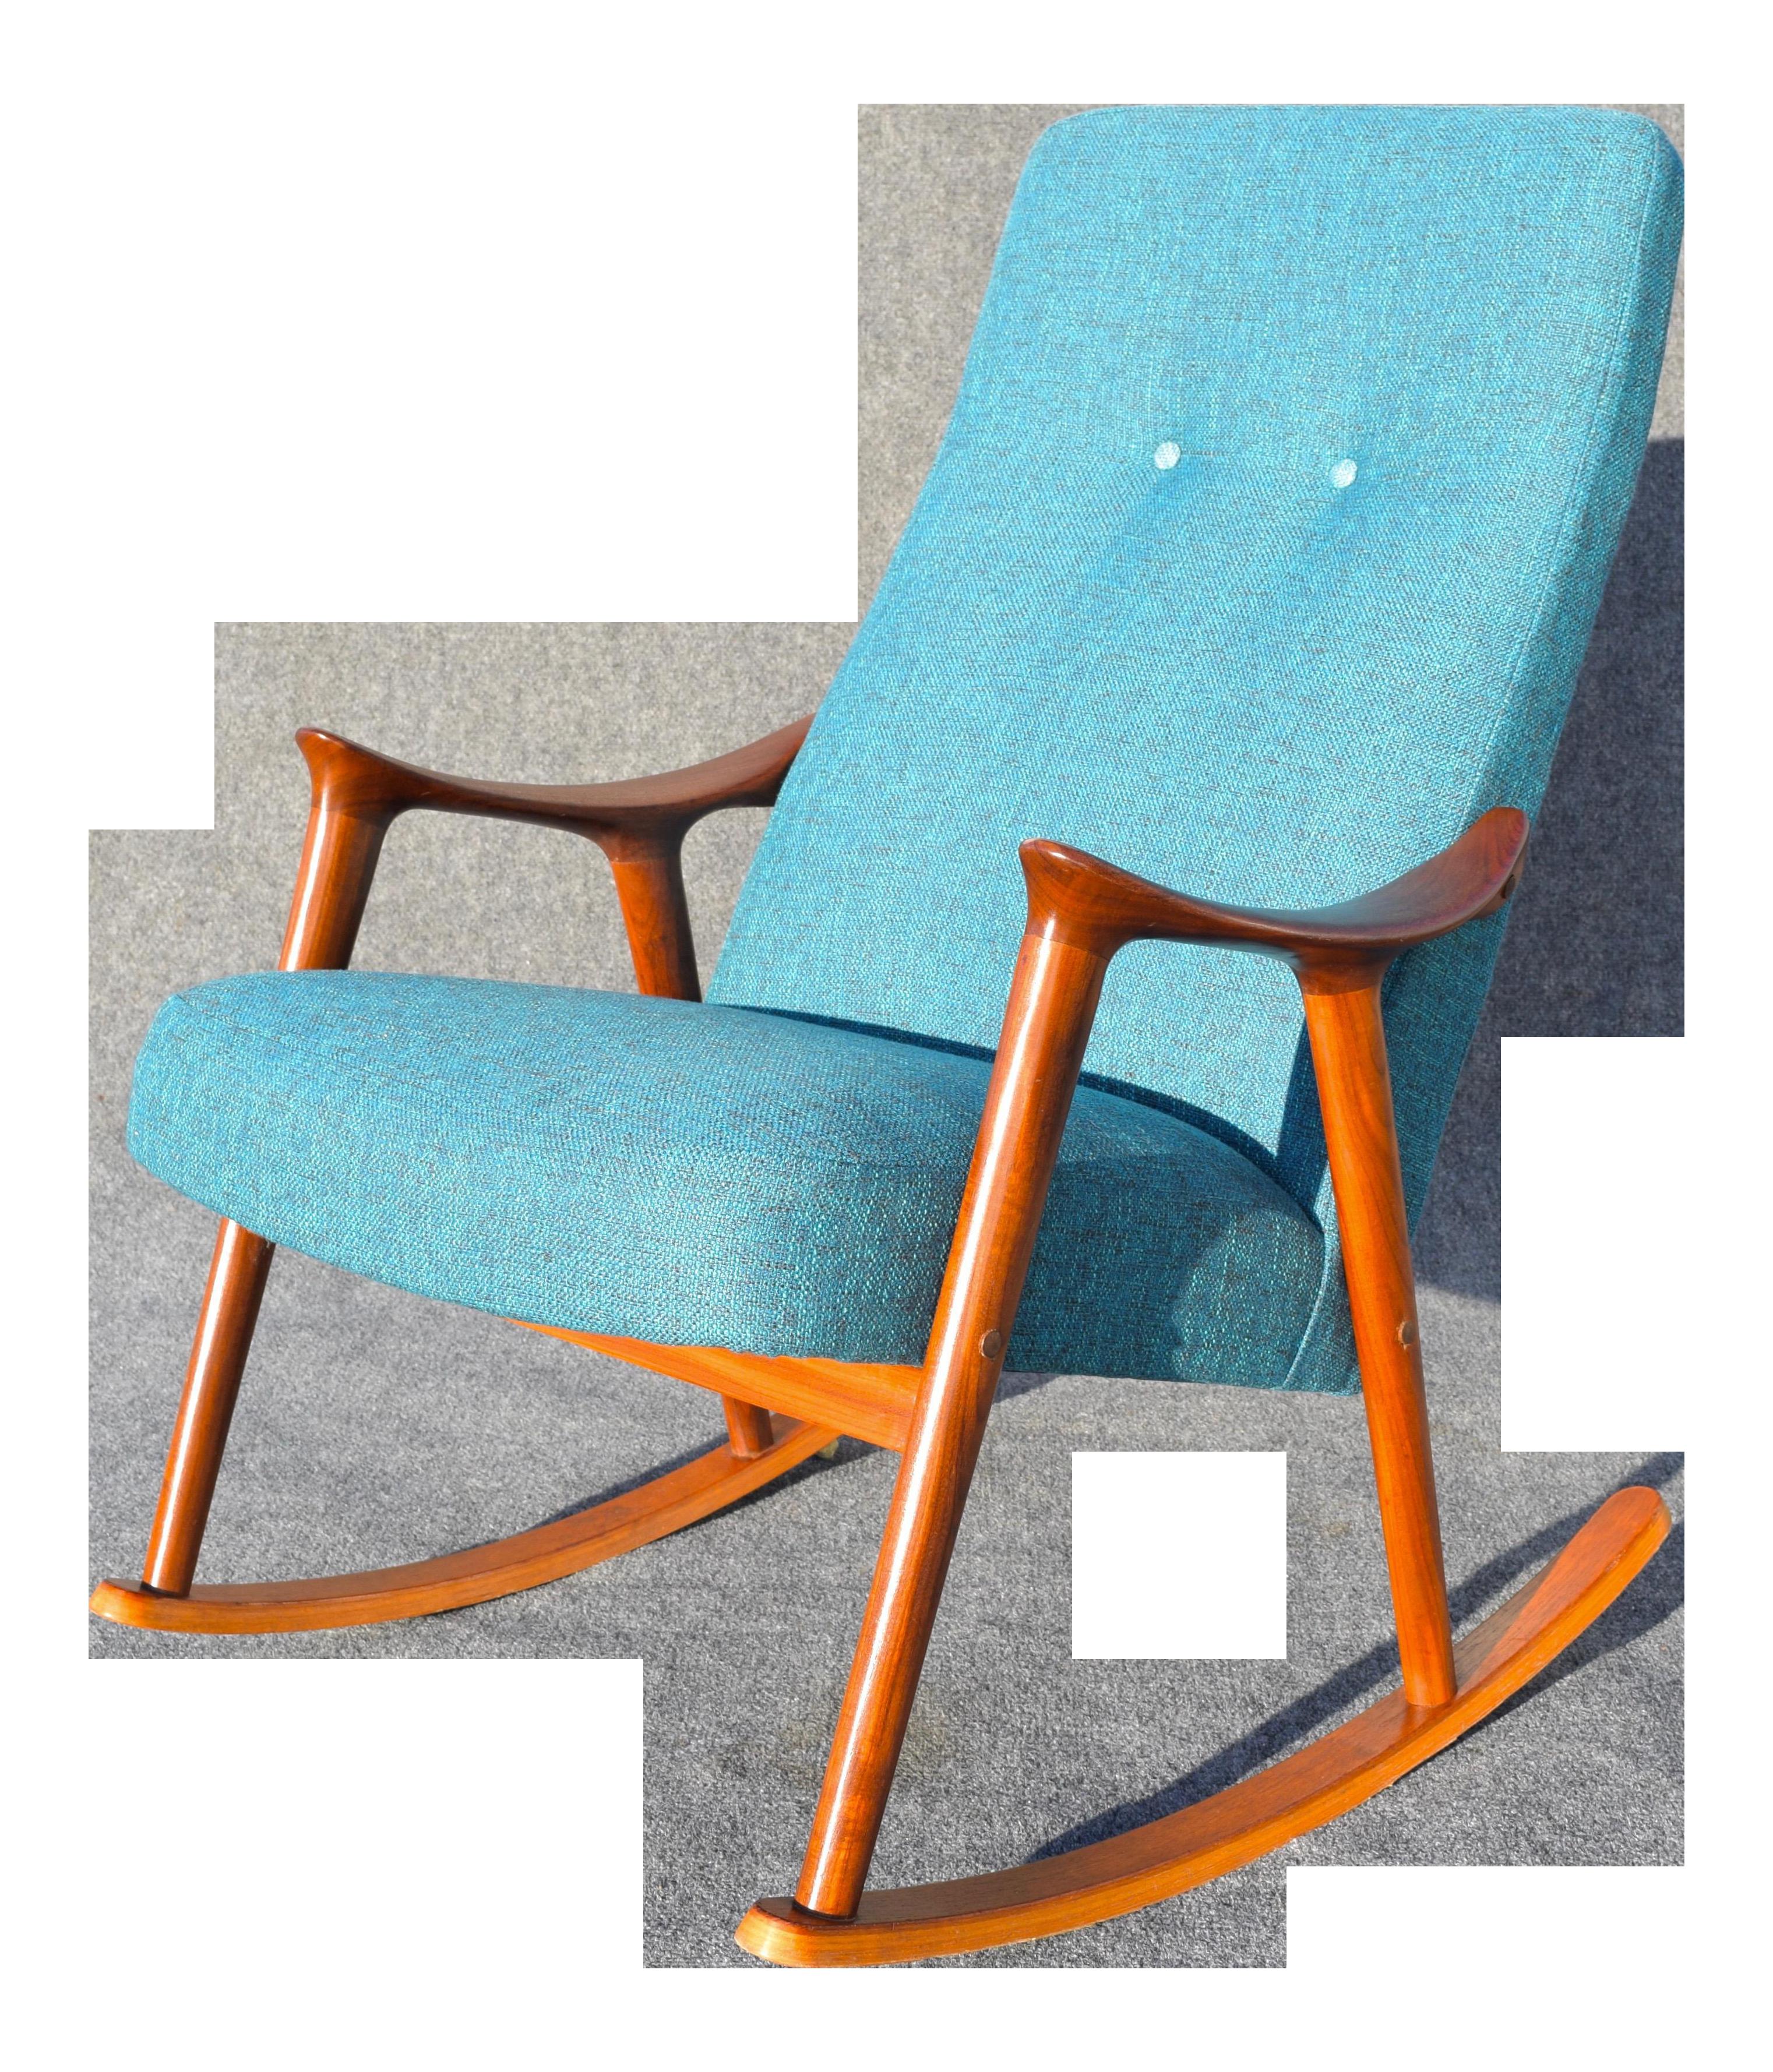 Danish Modern Rocking Chair Antique Cast Iron Garden Chairs Vintage By Rastad Relling For More Lenestolfabrikk